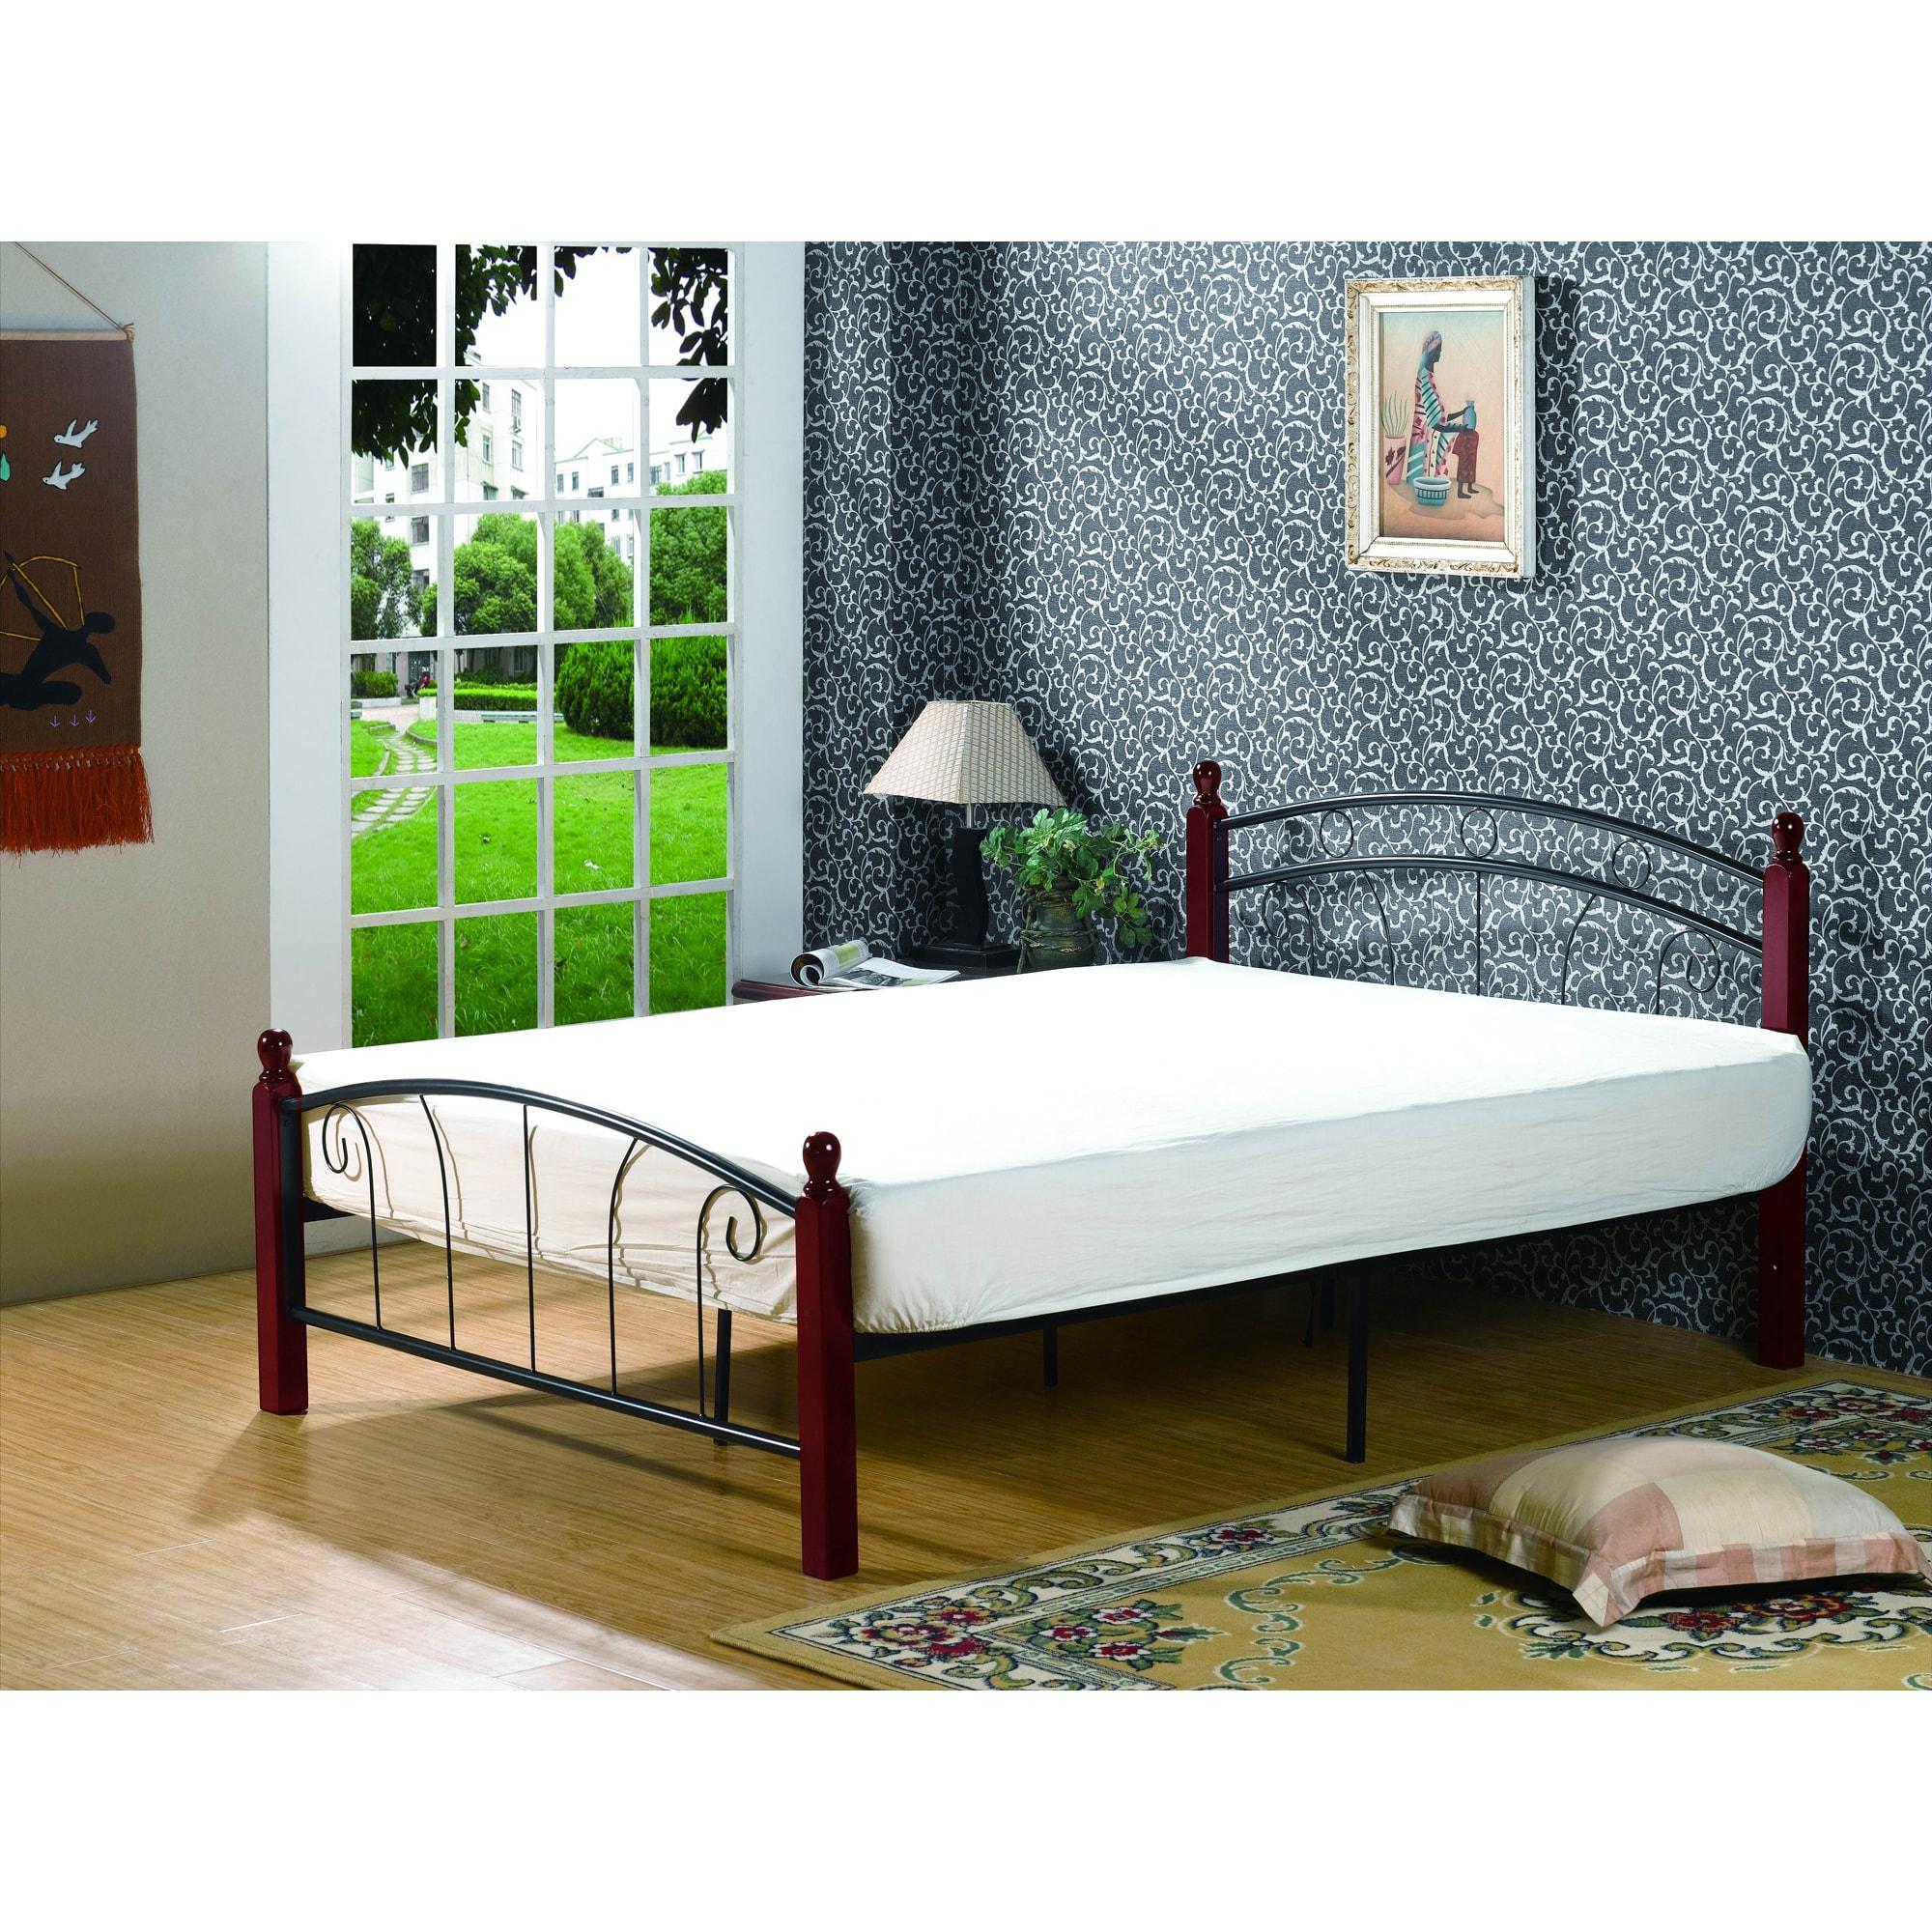 buy popular 55da6 7f668 Full-size Youth Bed